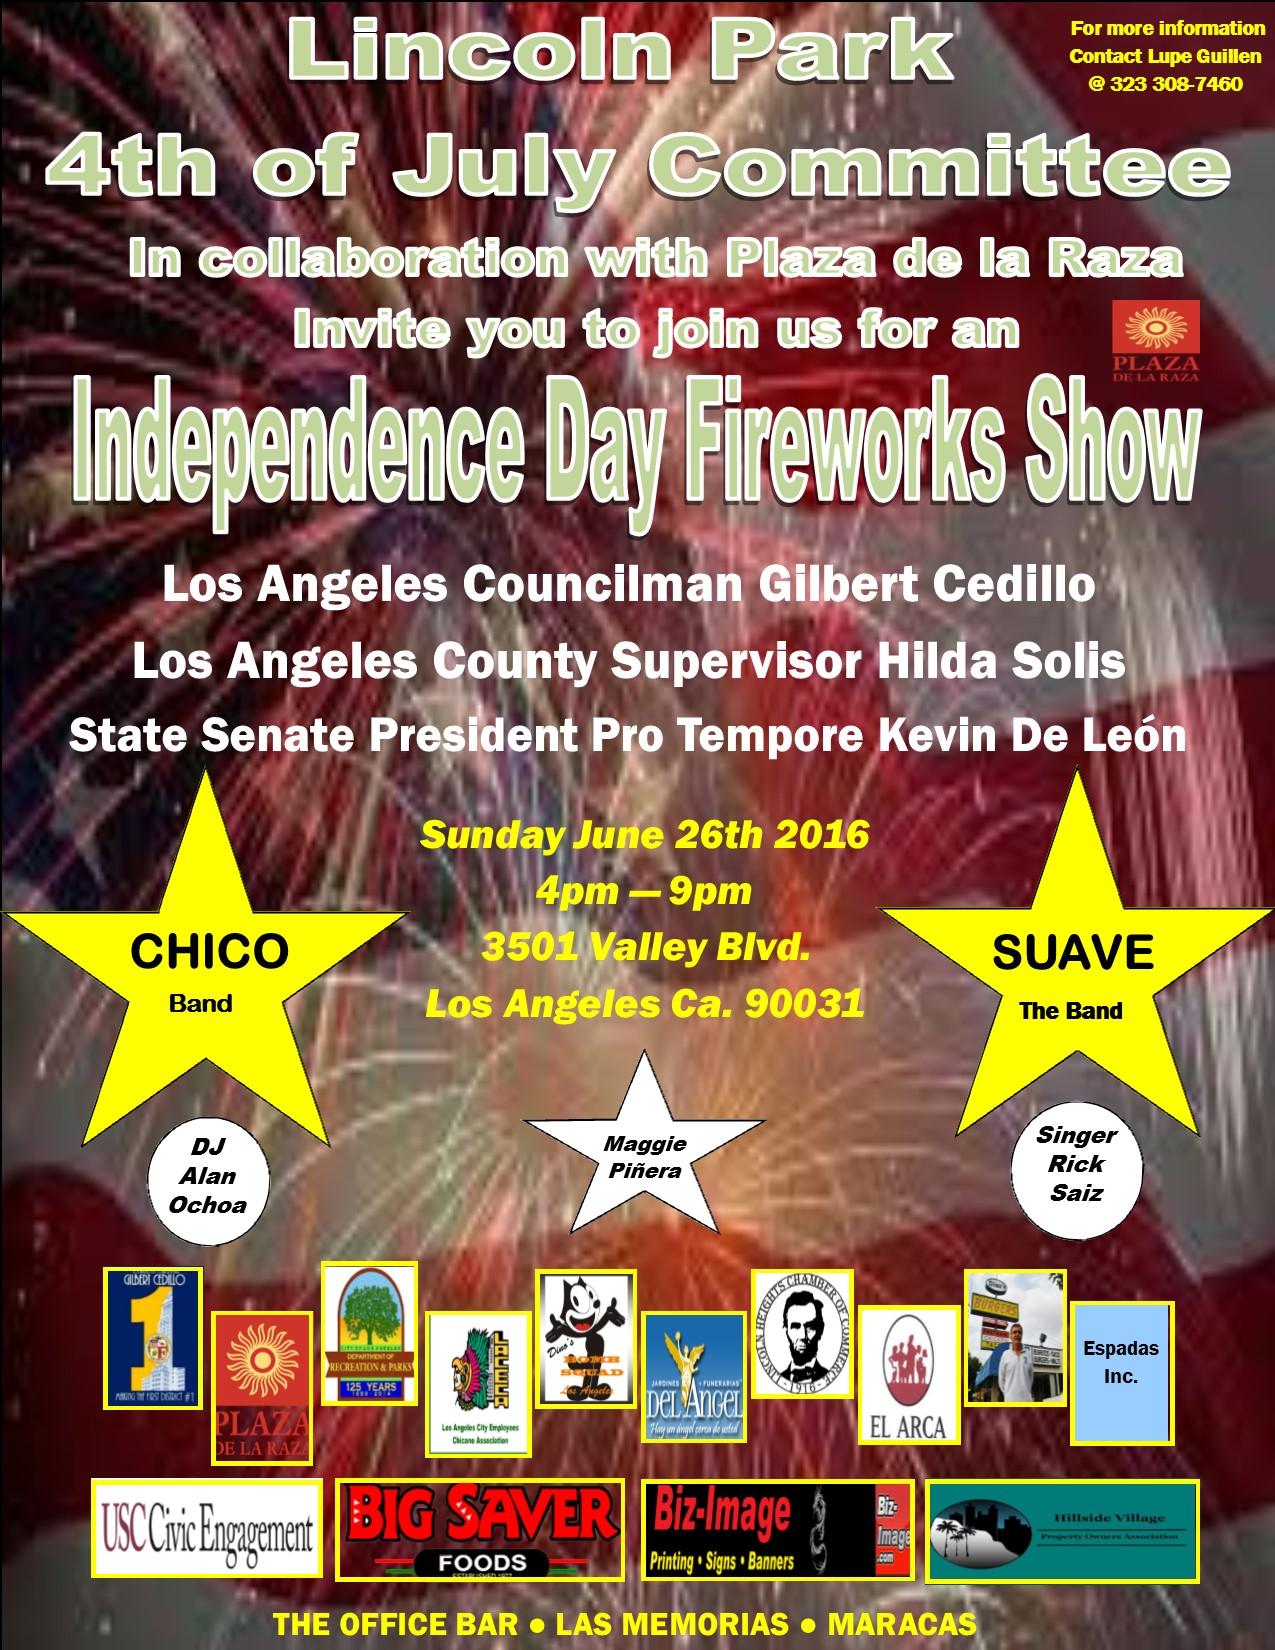 6-26-16 Lincoln Park Fireworks Flyer